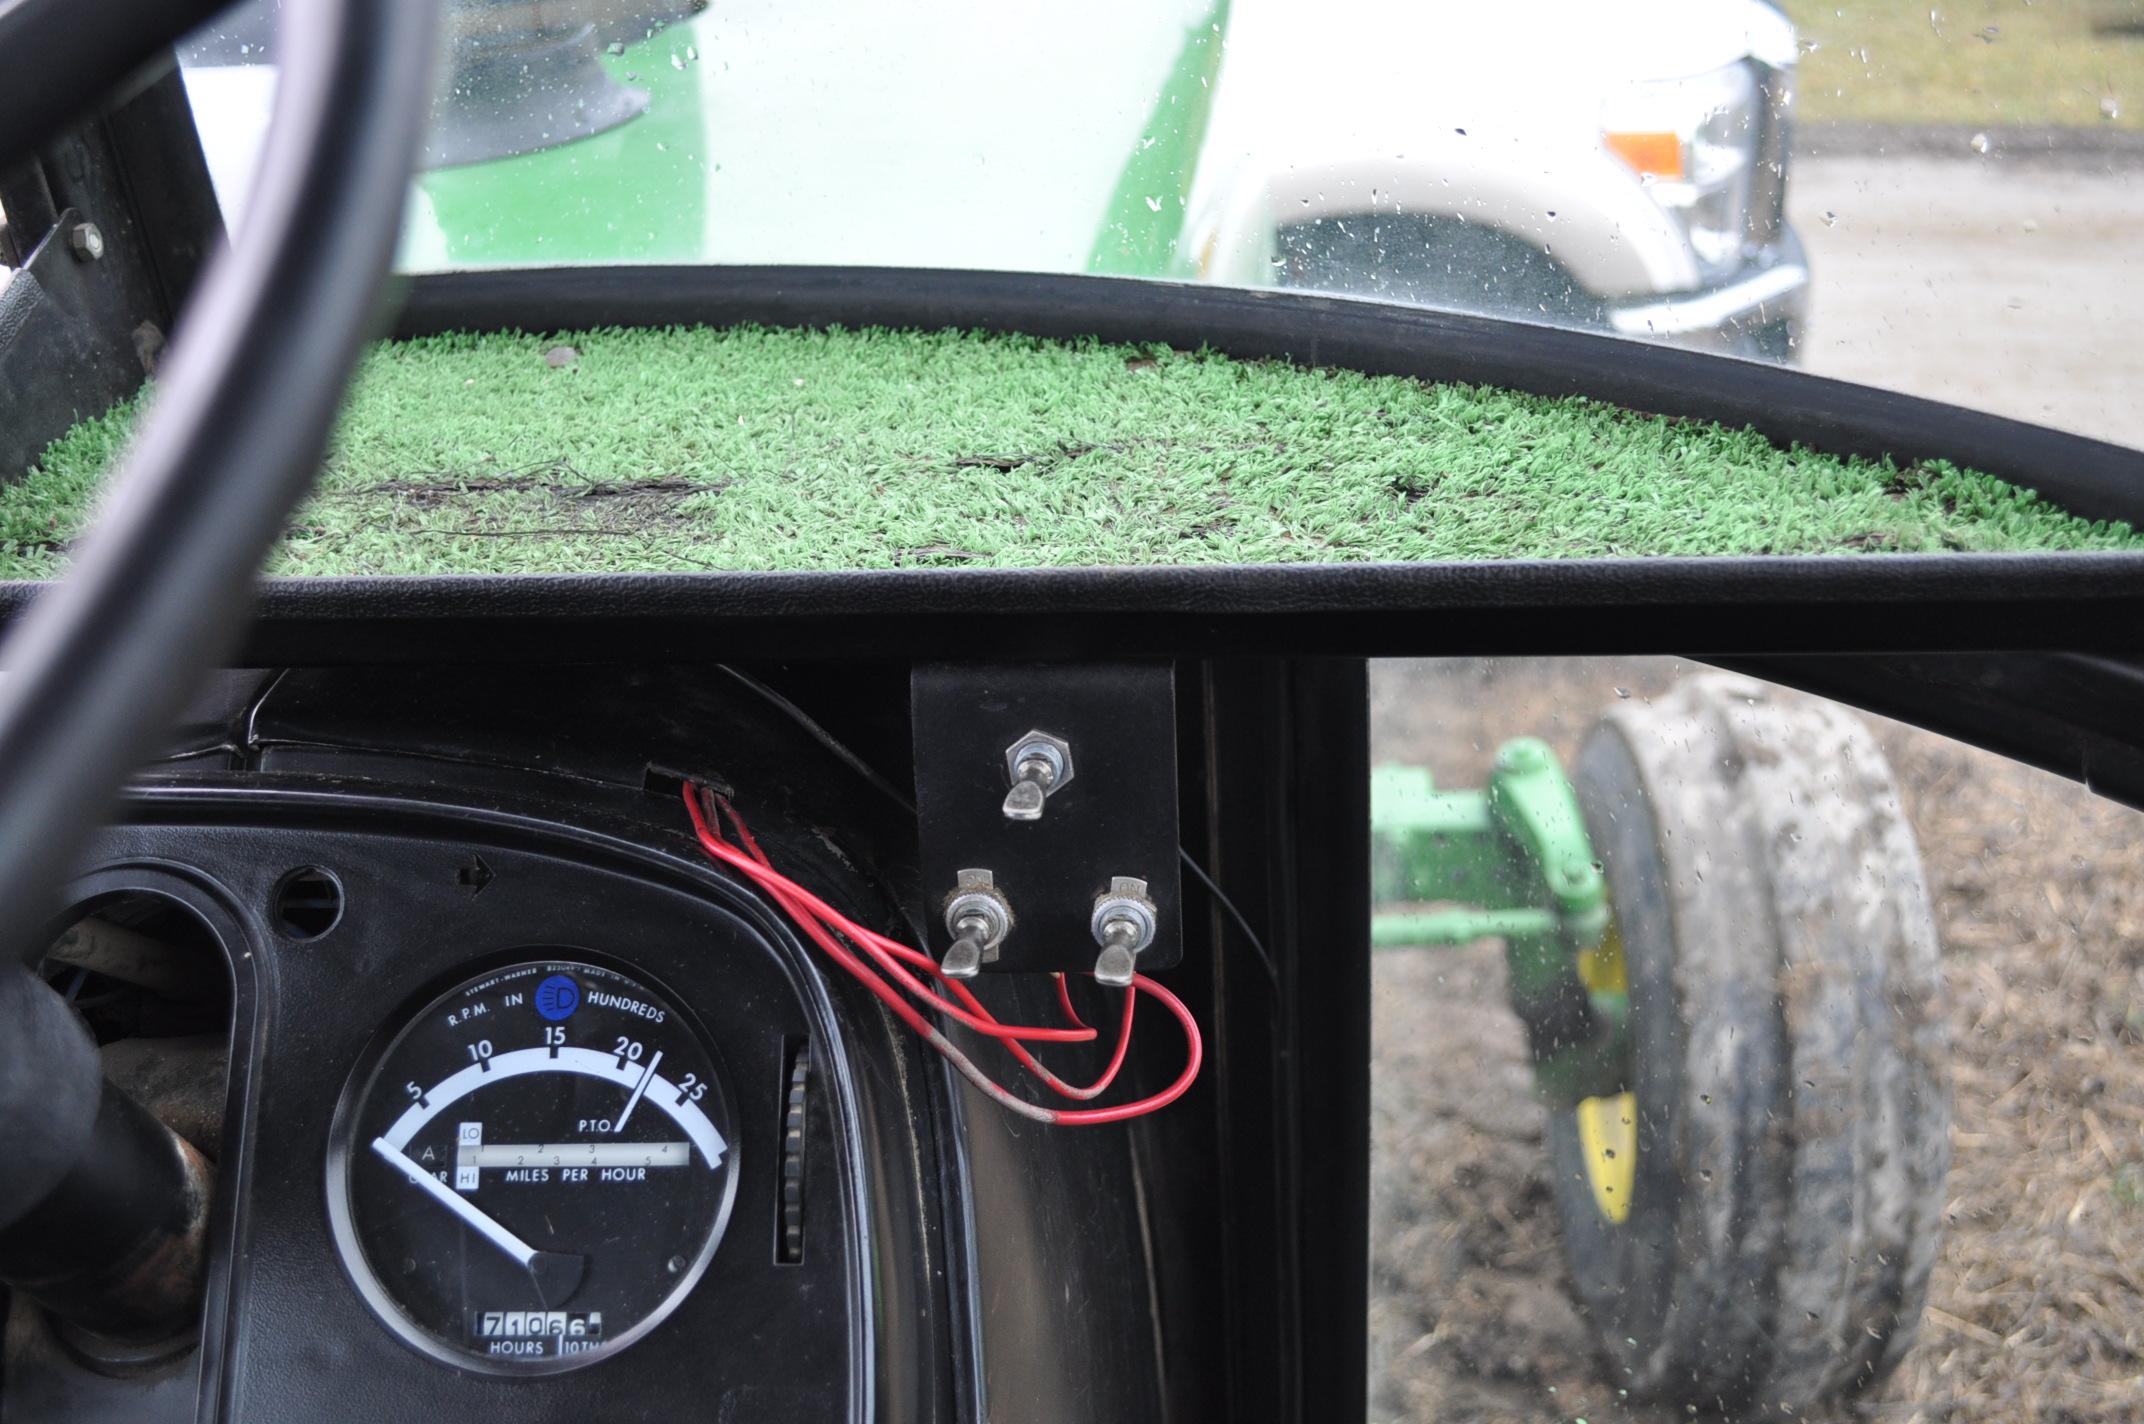 John Deere 4630 tractor, diesel, 20.8-38 hub duals, 14L-16 front, CHA, Quad range, 2 hyd remotes, - Image 21 of 22